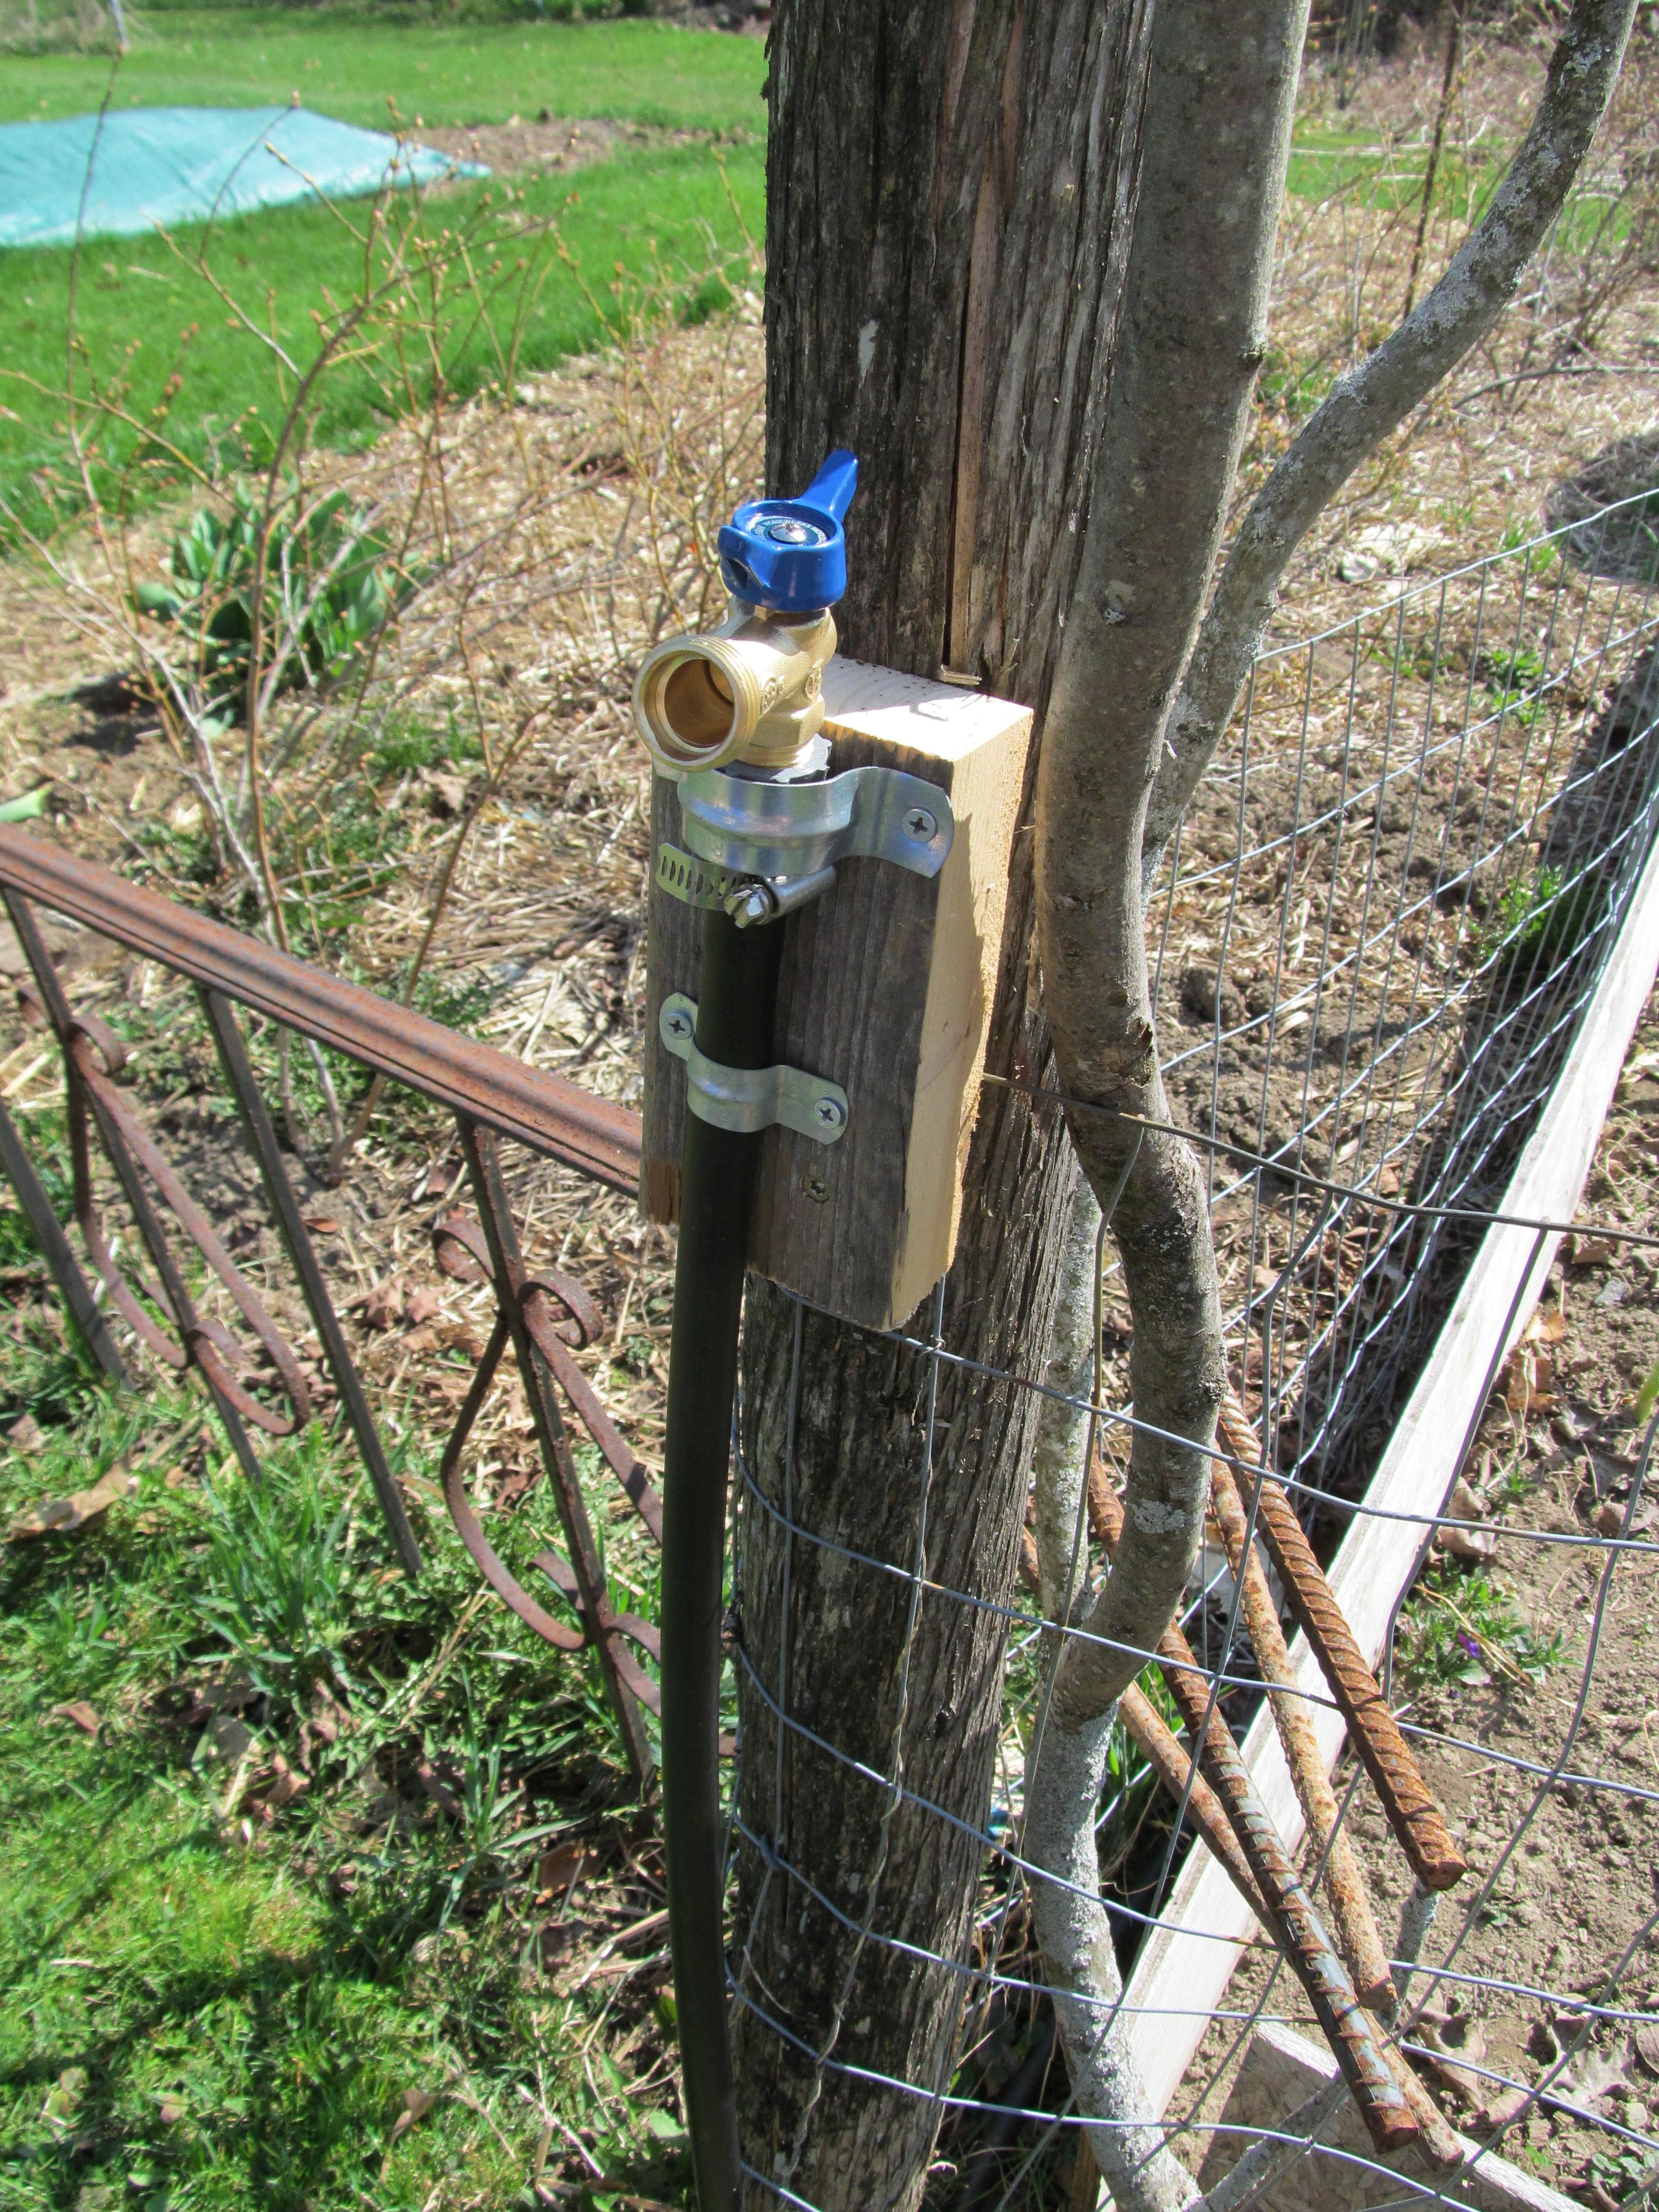 Ideas, homey idea garden spigot stylish design hose faucet extender view pertaining to sizing 3240 x 4320  .